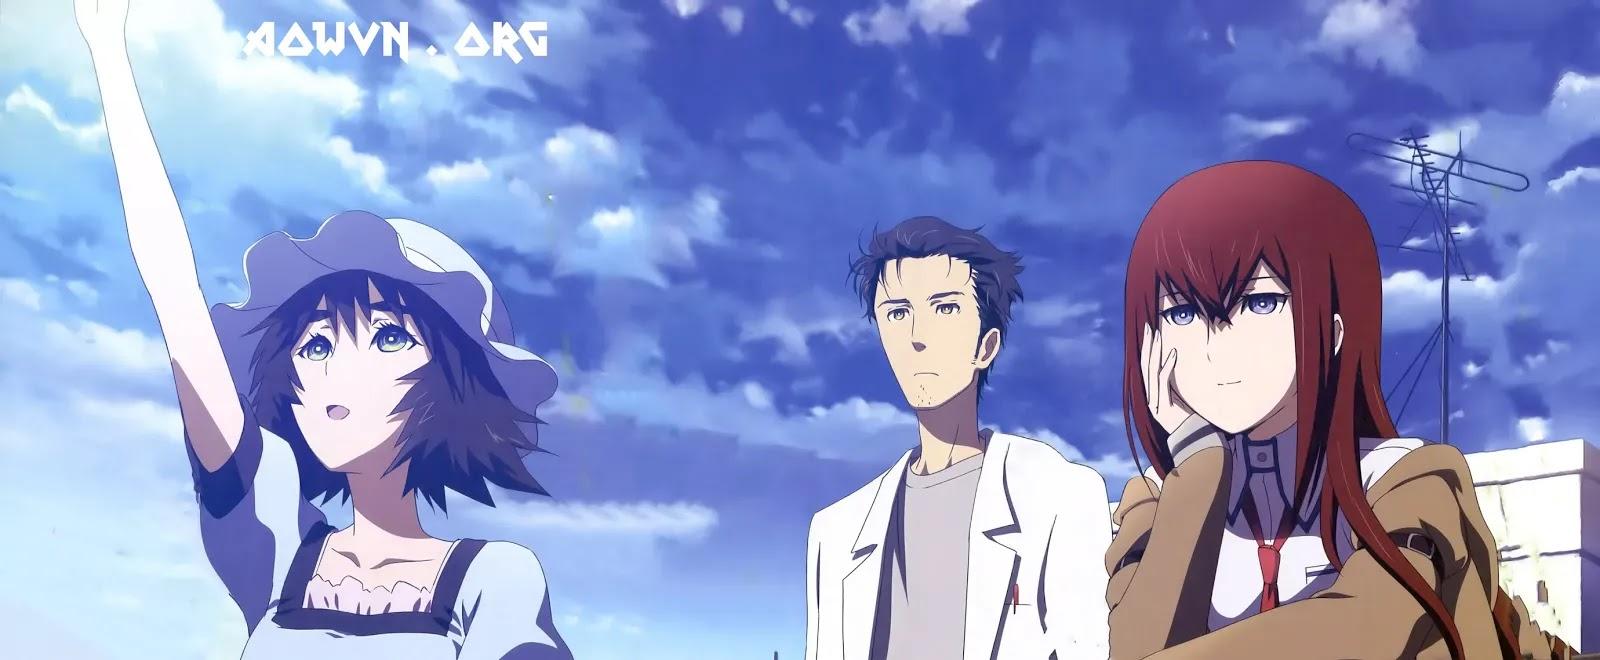 AowVN.org minz%2B%25281%2529 - [ Anime 3gp Mp4 ] Steins;Gate + Specials + Movie | Vietsub - Tuyệt Phẩm Cực Hay